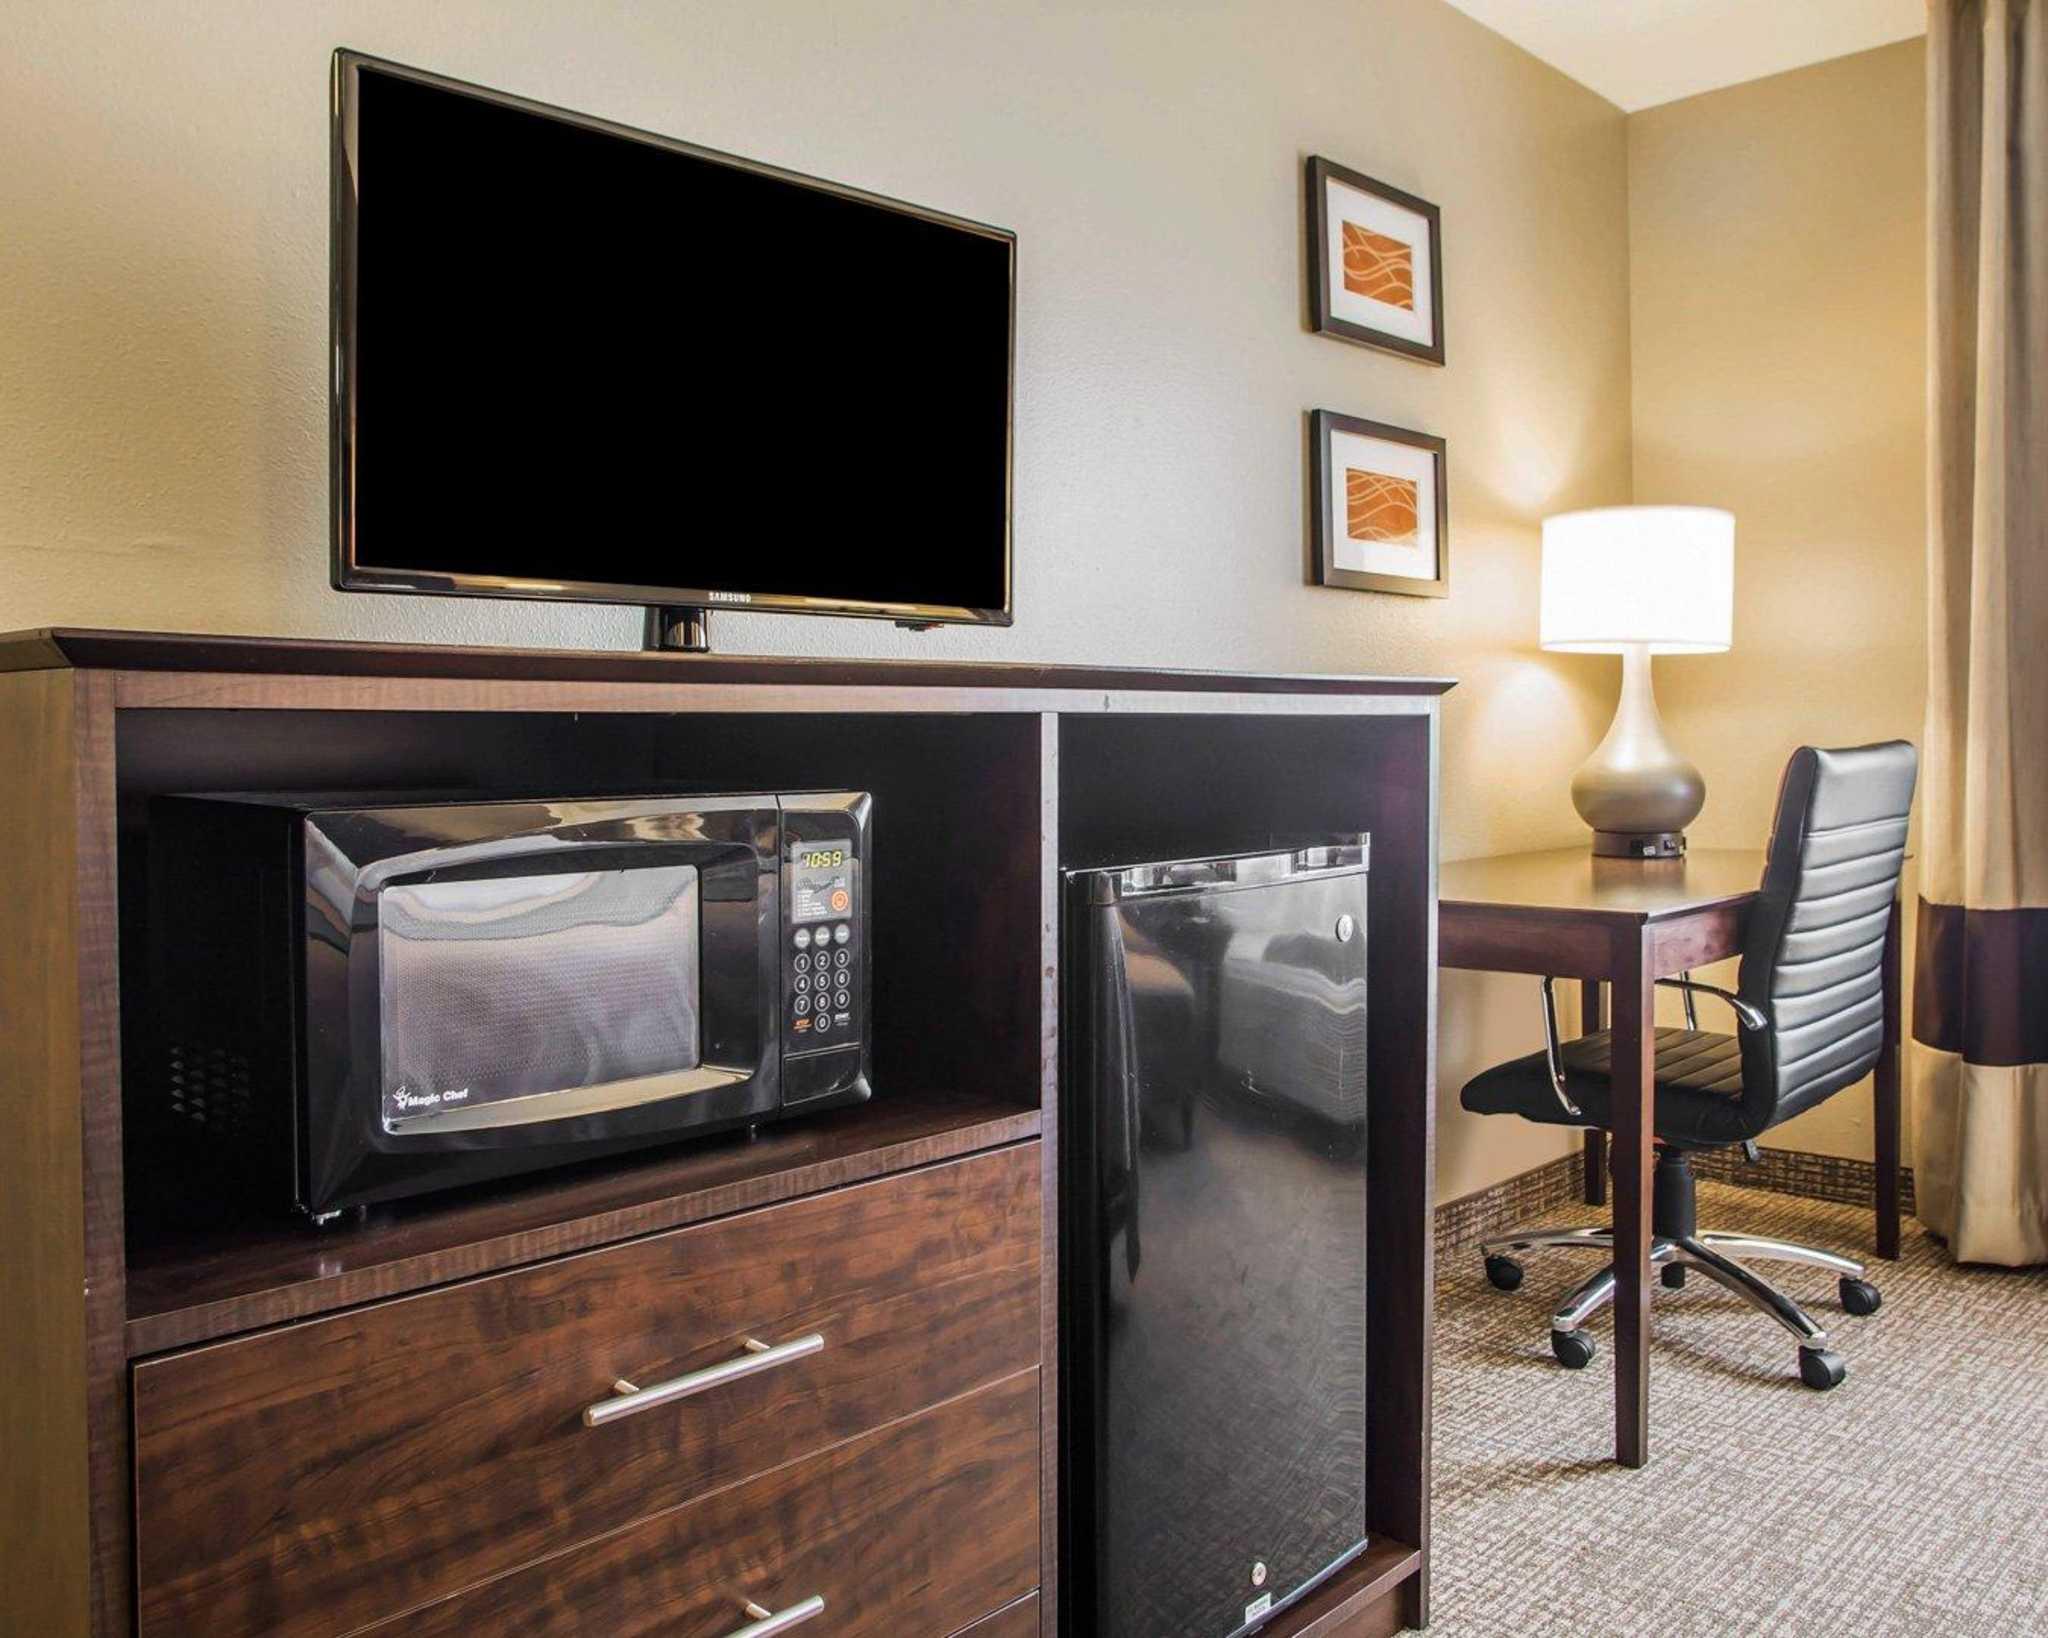 Comfort Inn & Suites Waterloo – Cedar Falls image 5